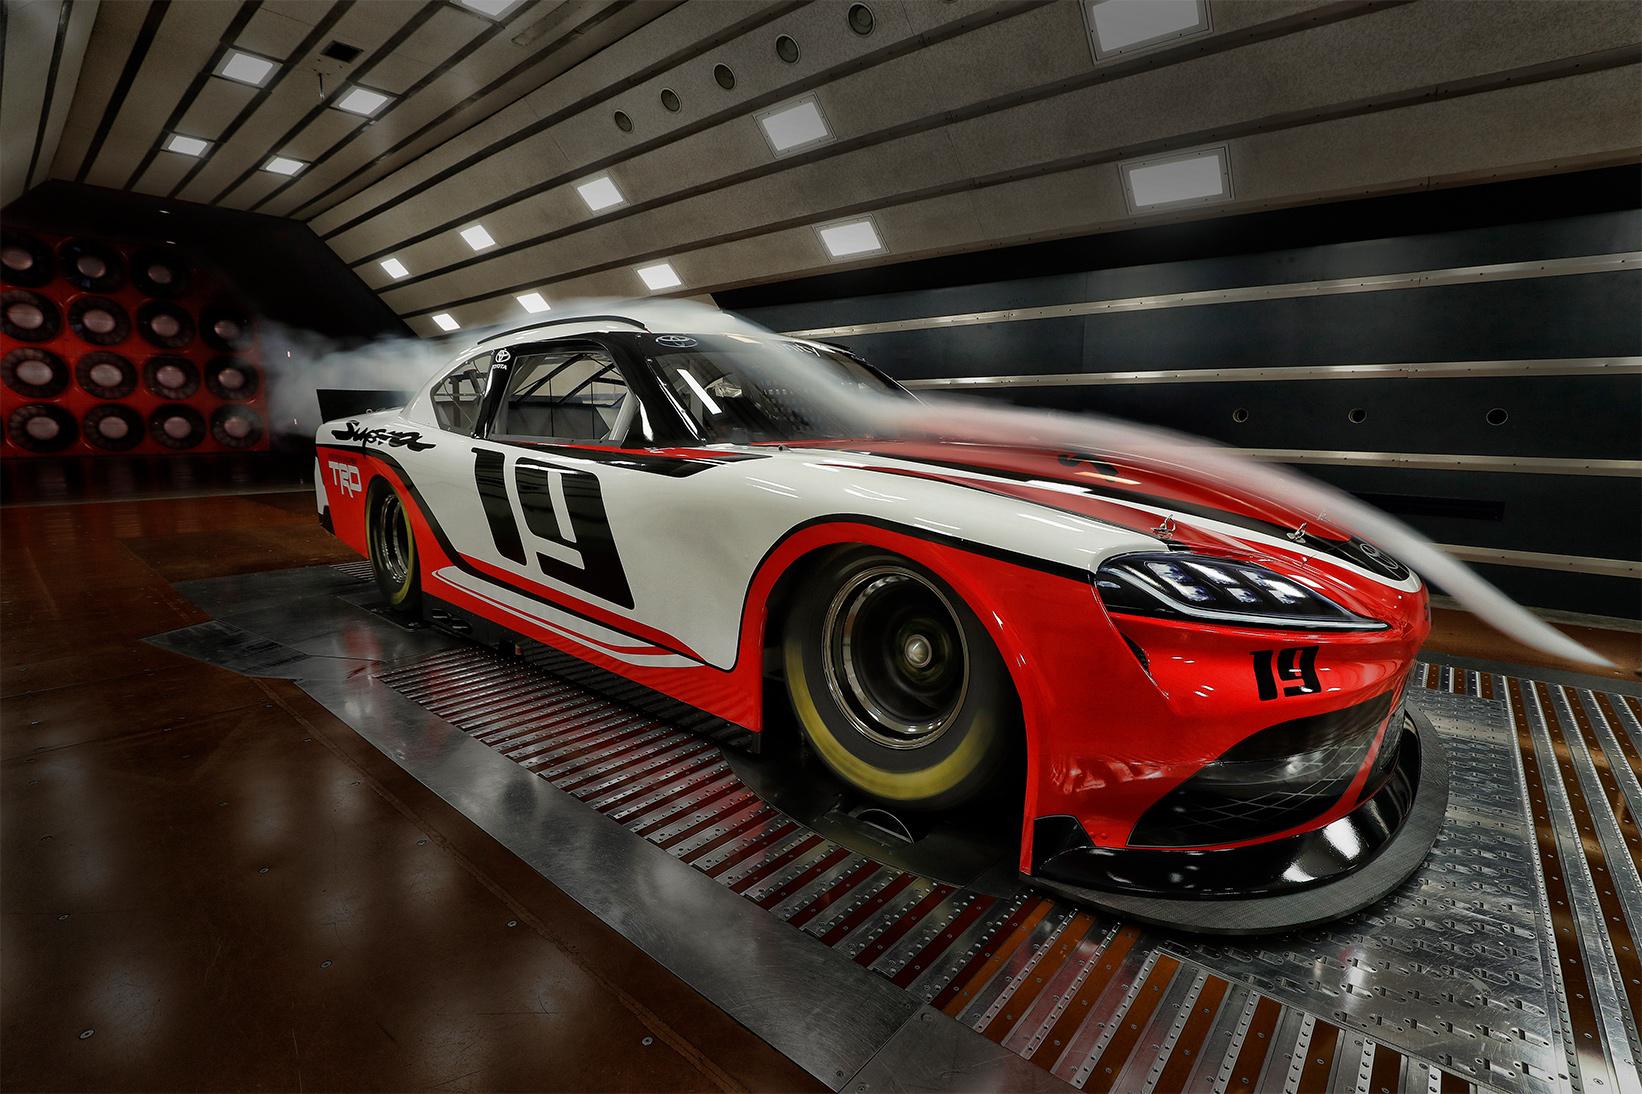 TrackWorthy - 2019 NASCAR Xfinity Series Toyota Supra (3)